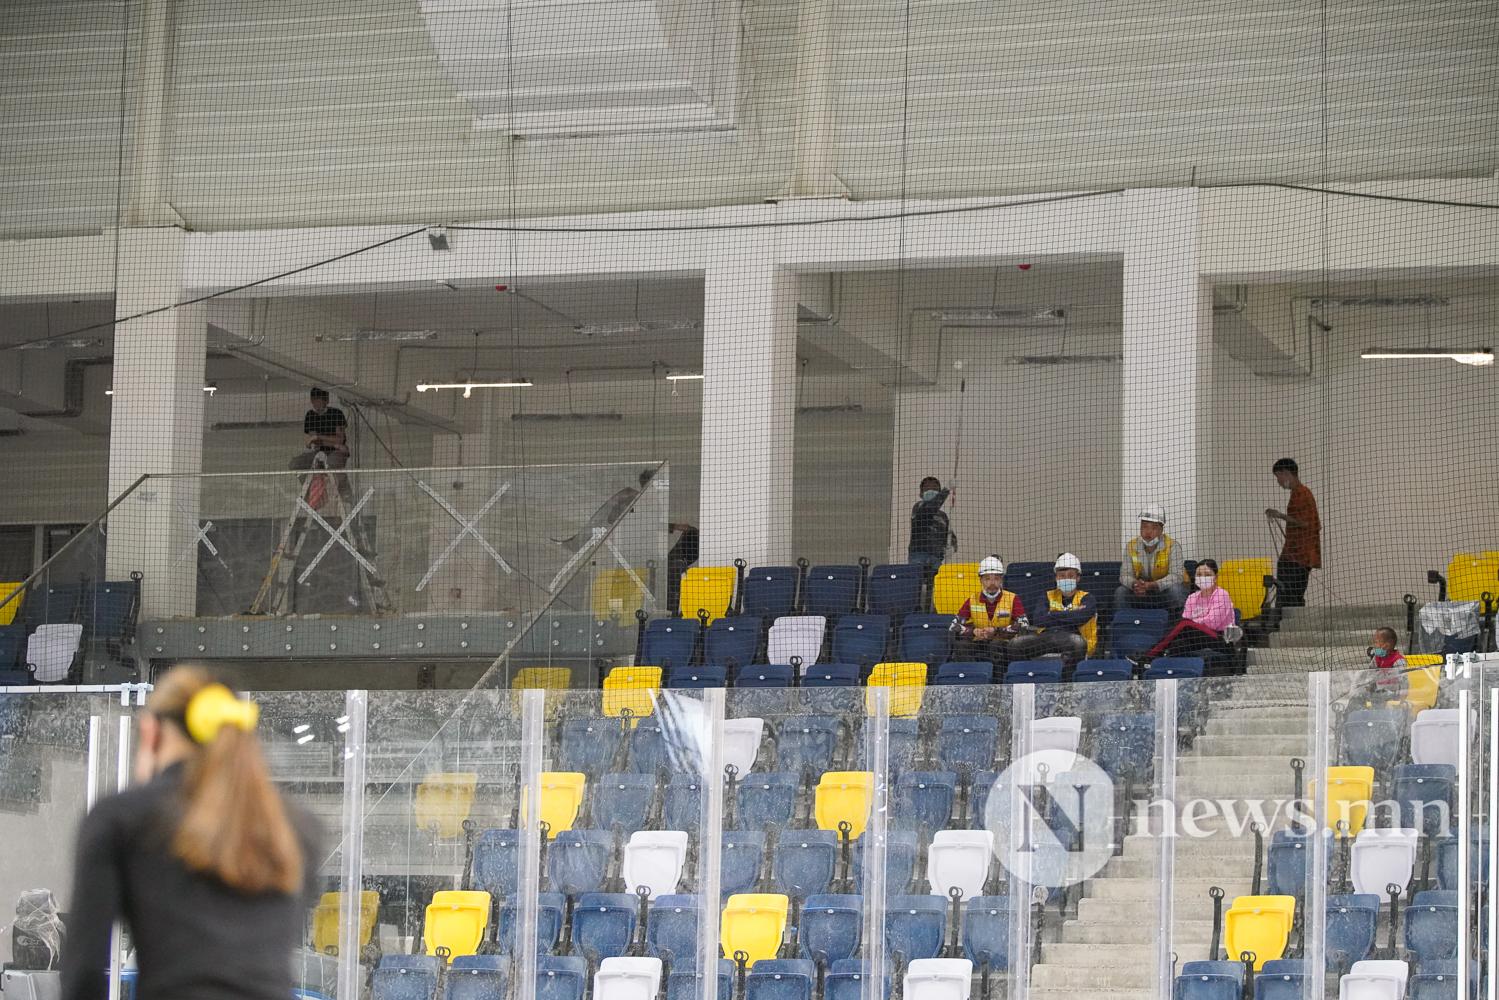 Steppe Arena Мөсөн ордон (17 of 24)